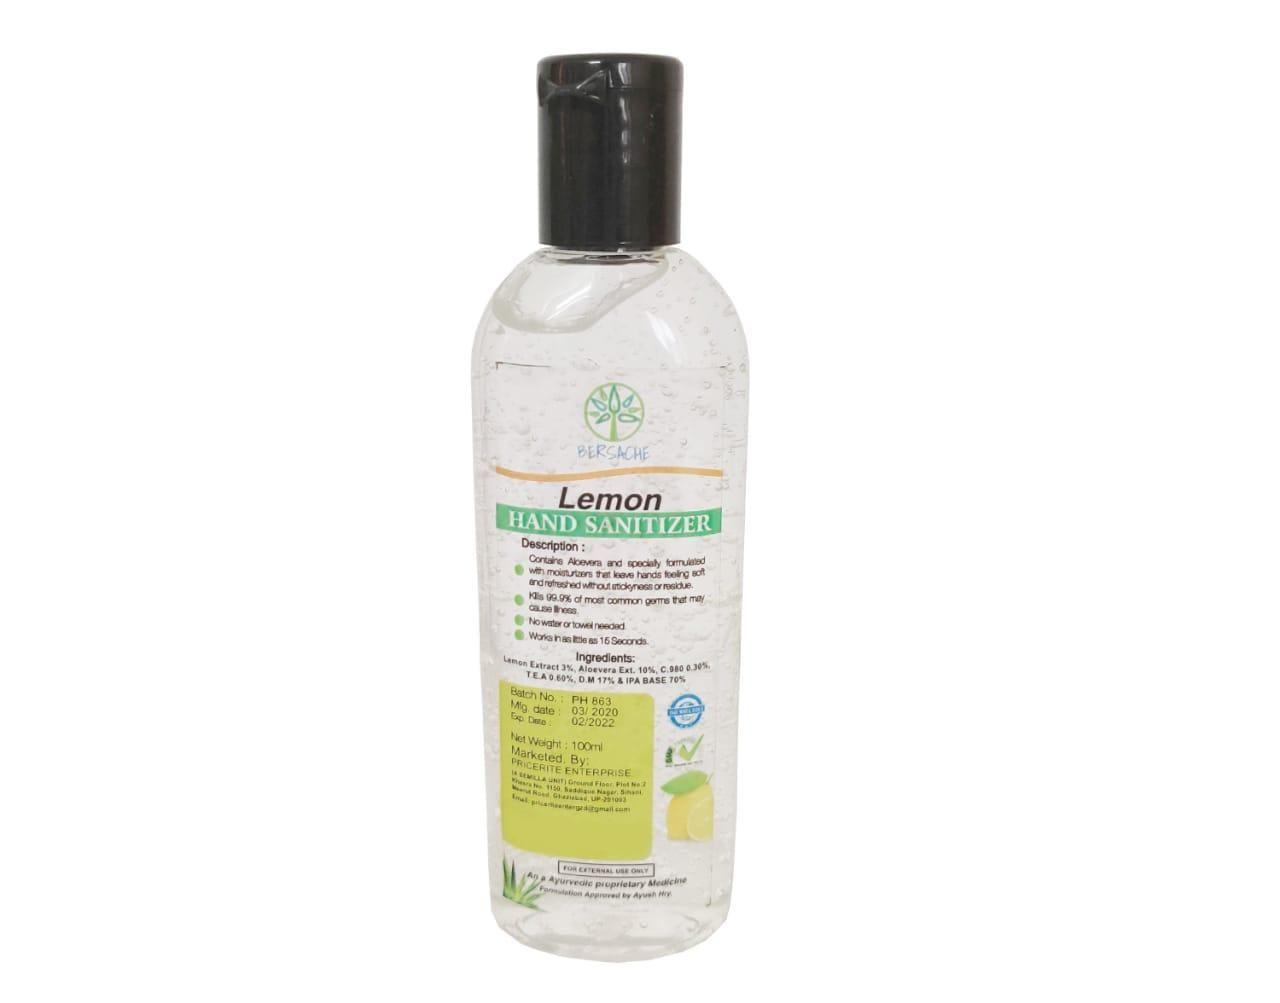 Sanitizer & Face Mask - Washable Face Masks & Sanitizers Combo 1 pc + 1 pc